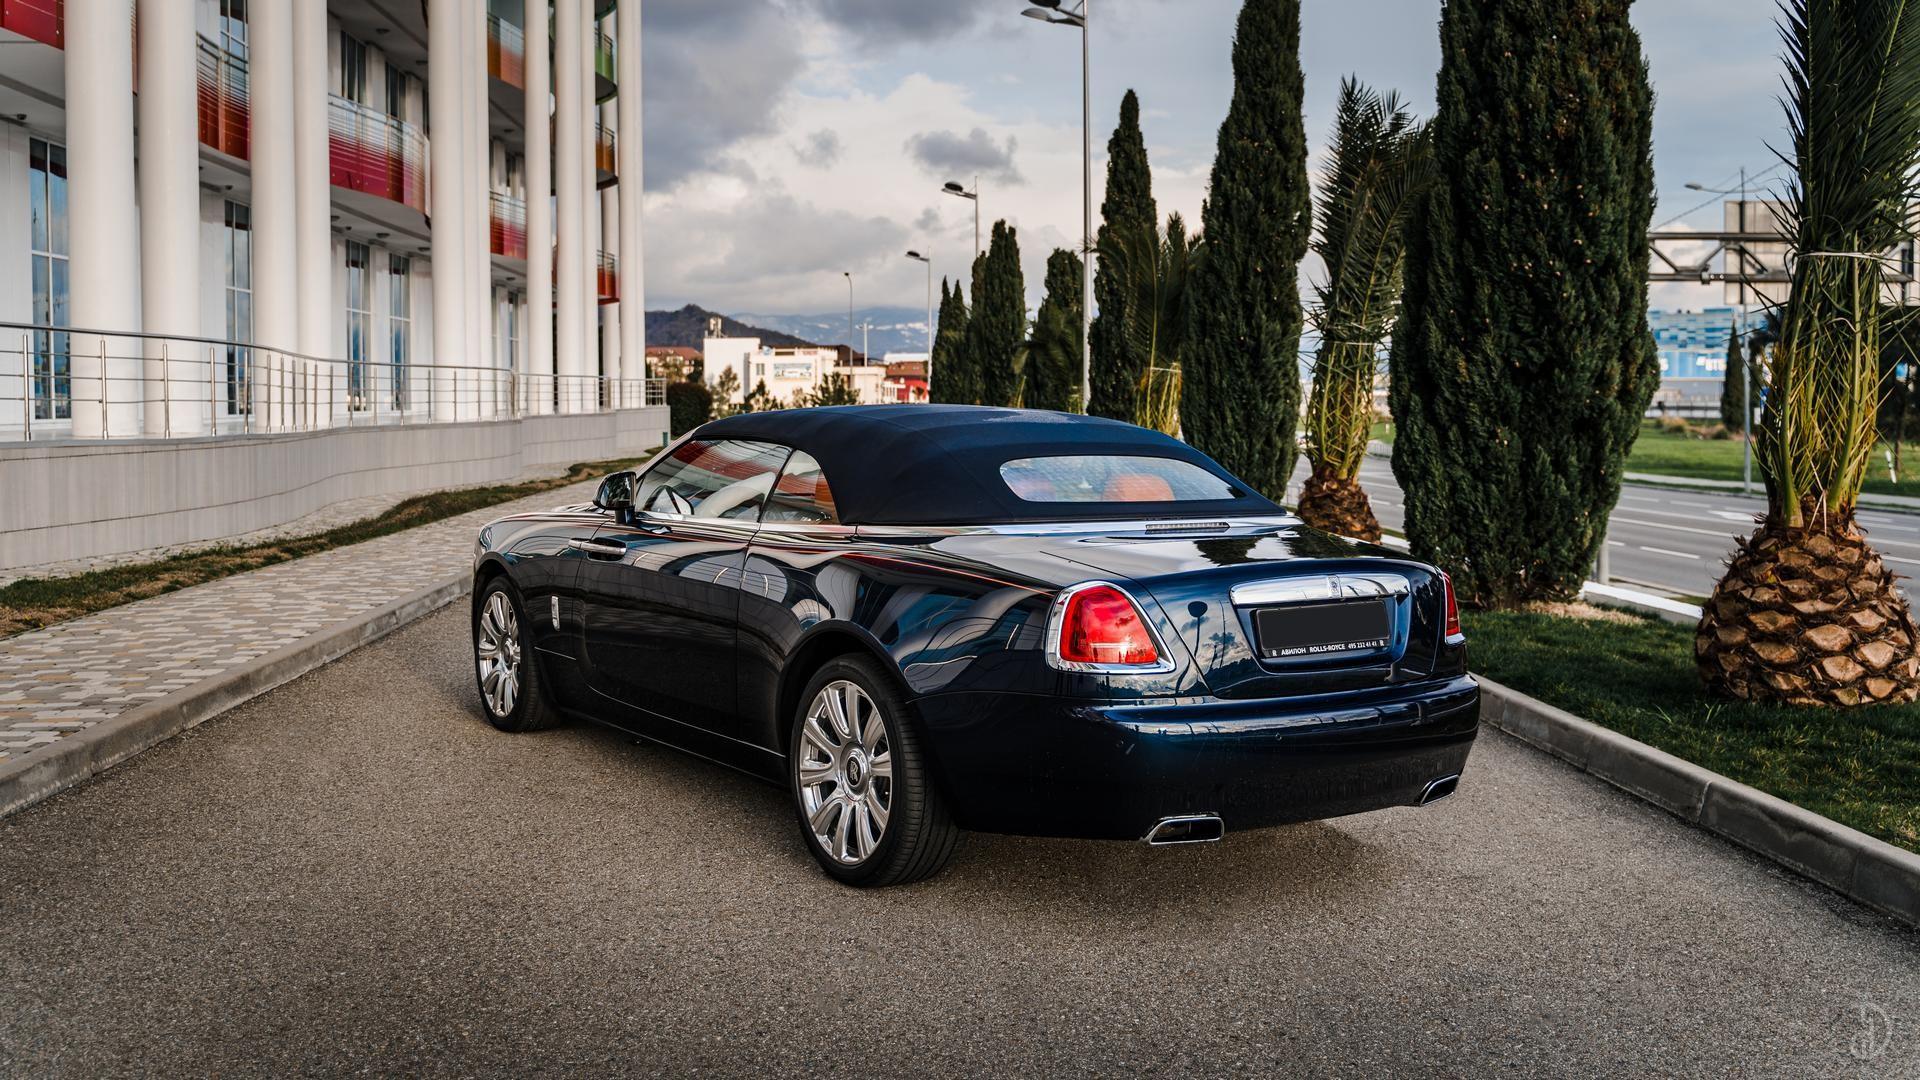 Аренда Rolls-Royce Dawn в Сочи. Фото 4